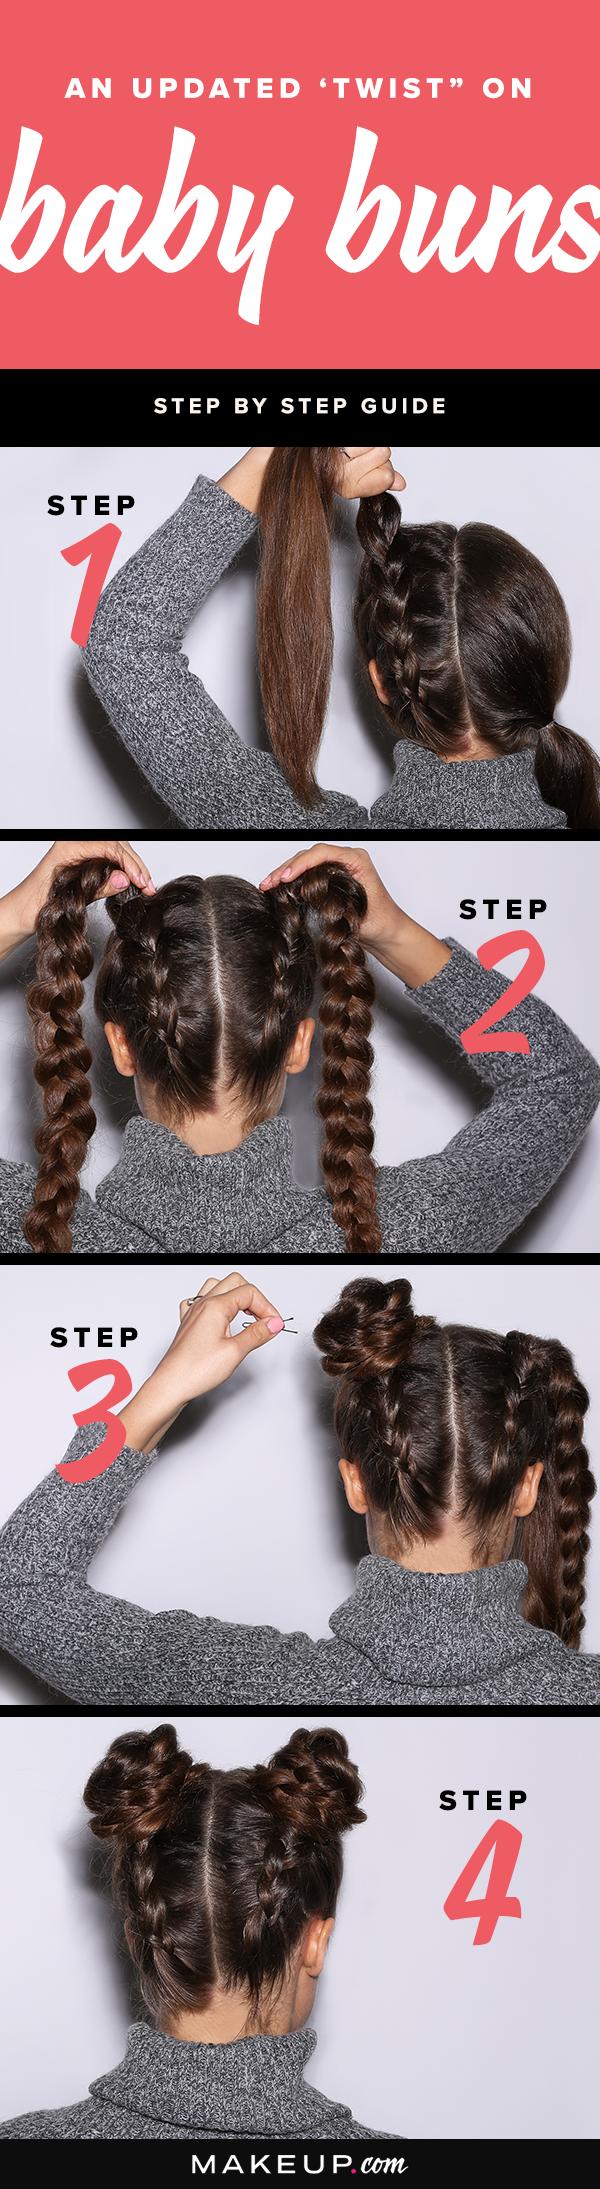 How to create braided baby buns bun hairstyle diy hair and tutorials